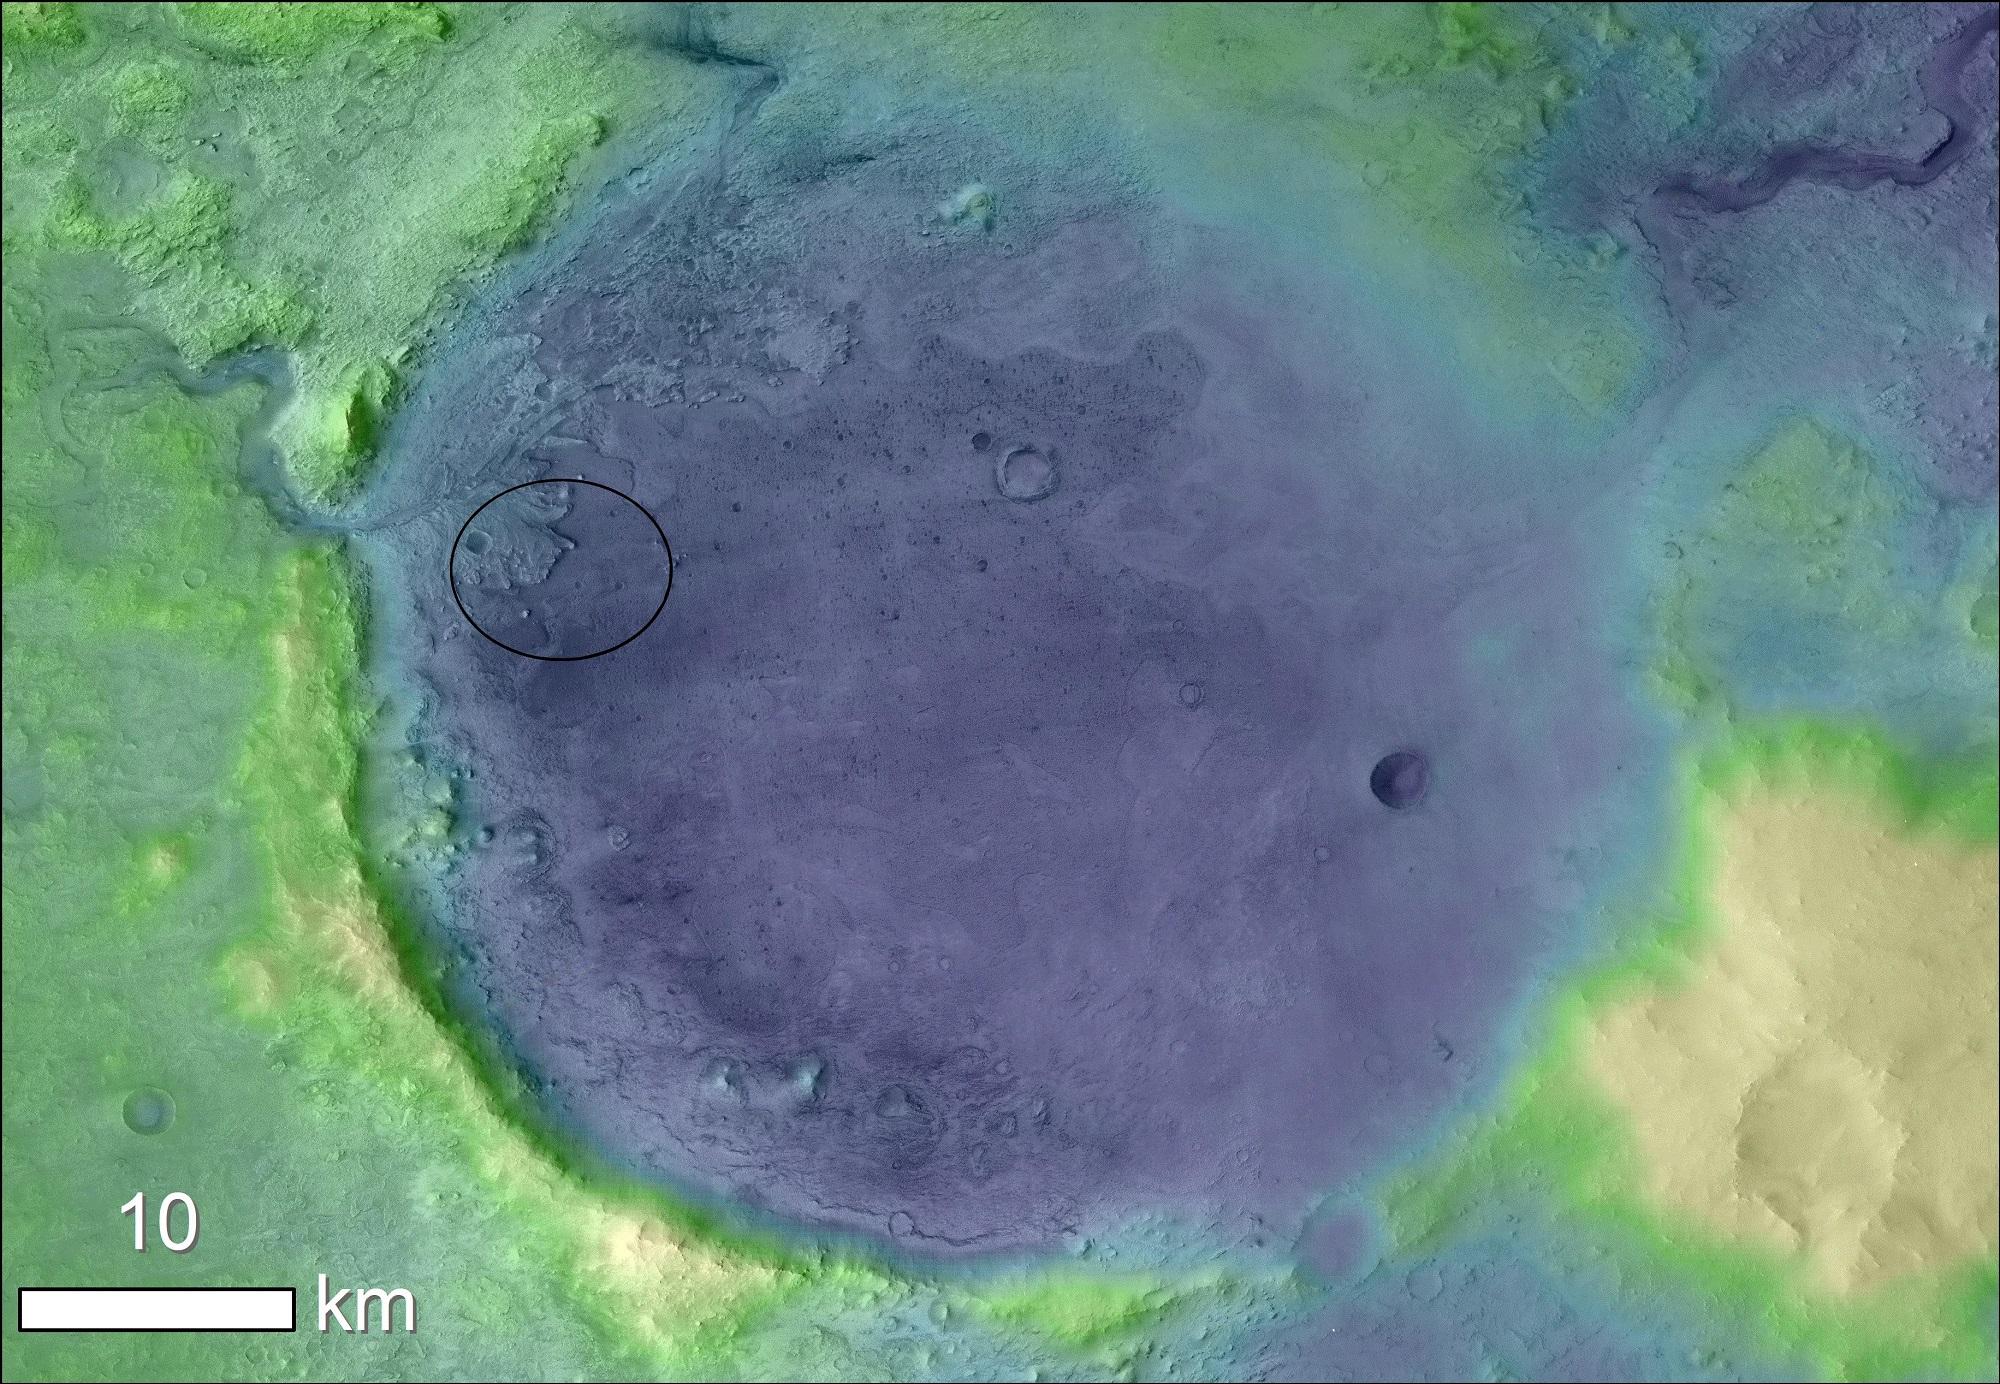 Jezero_crater_elevation_map_2k.jpg